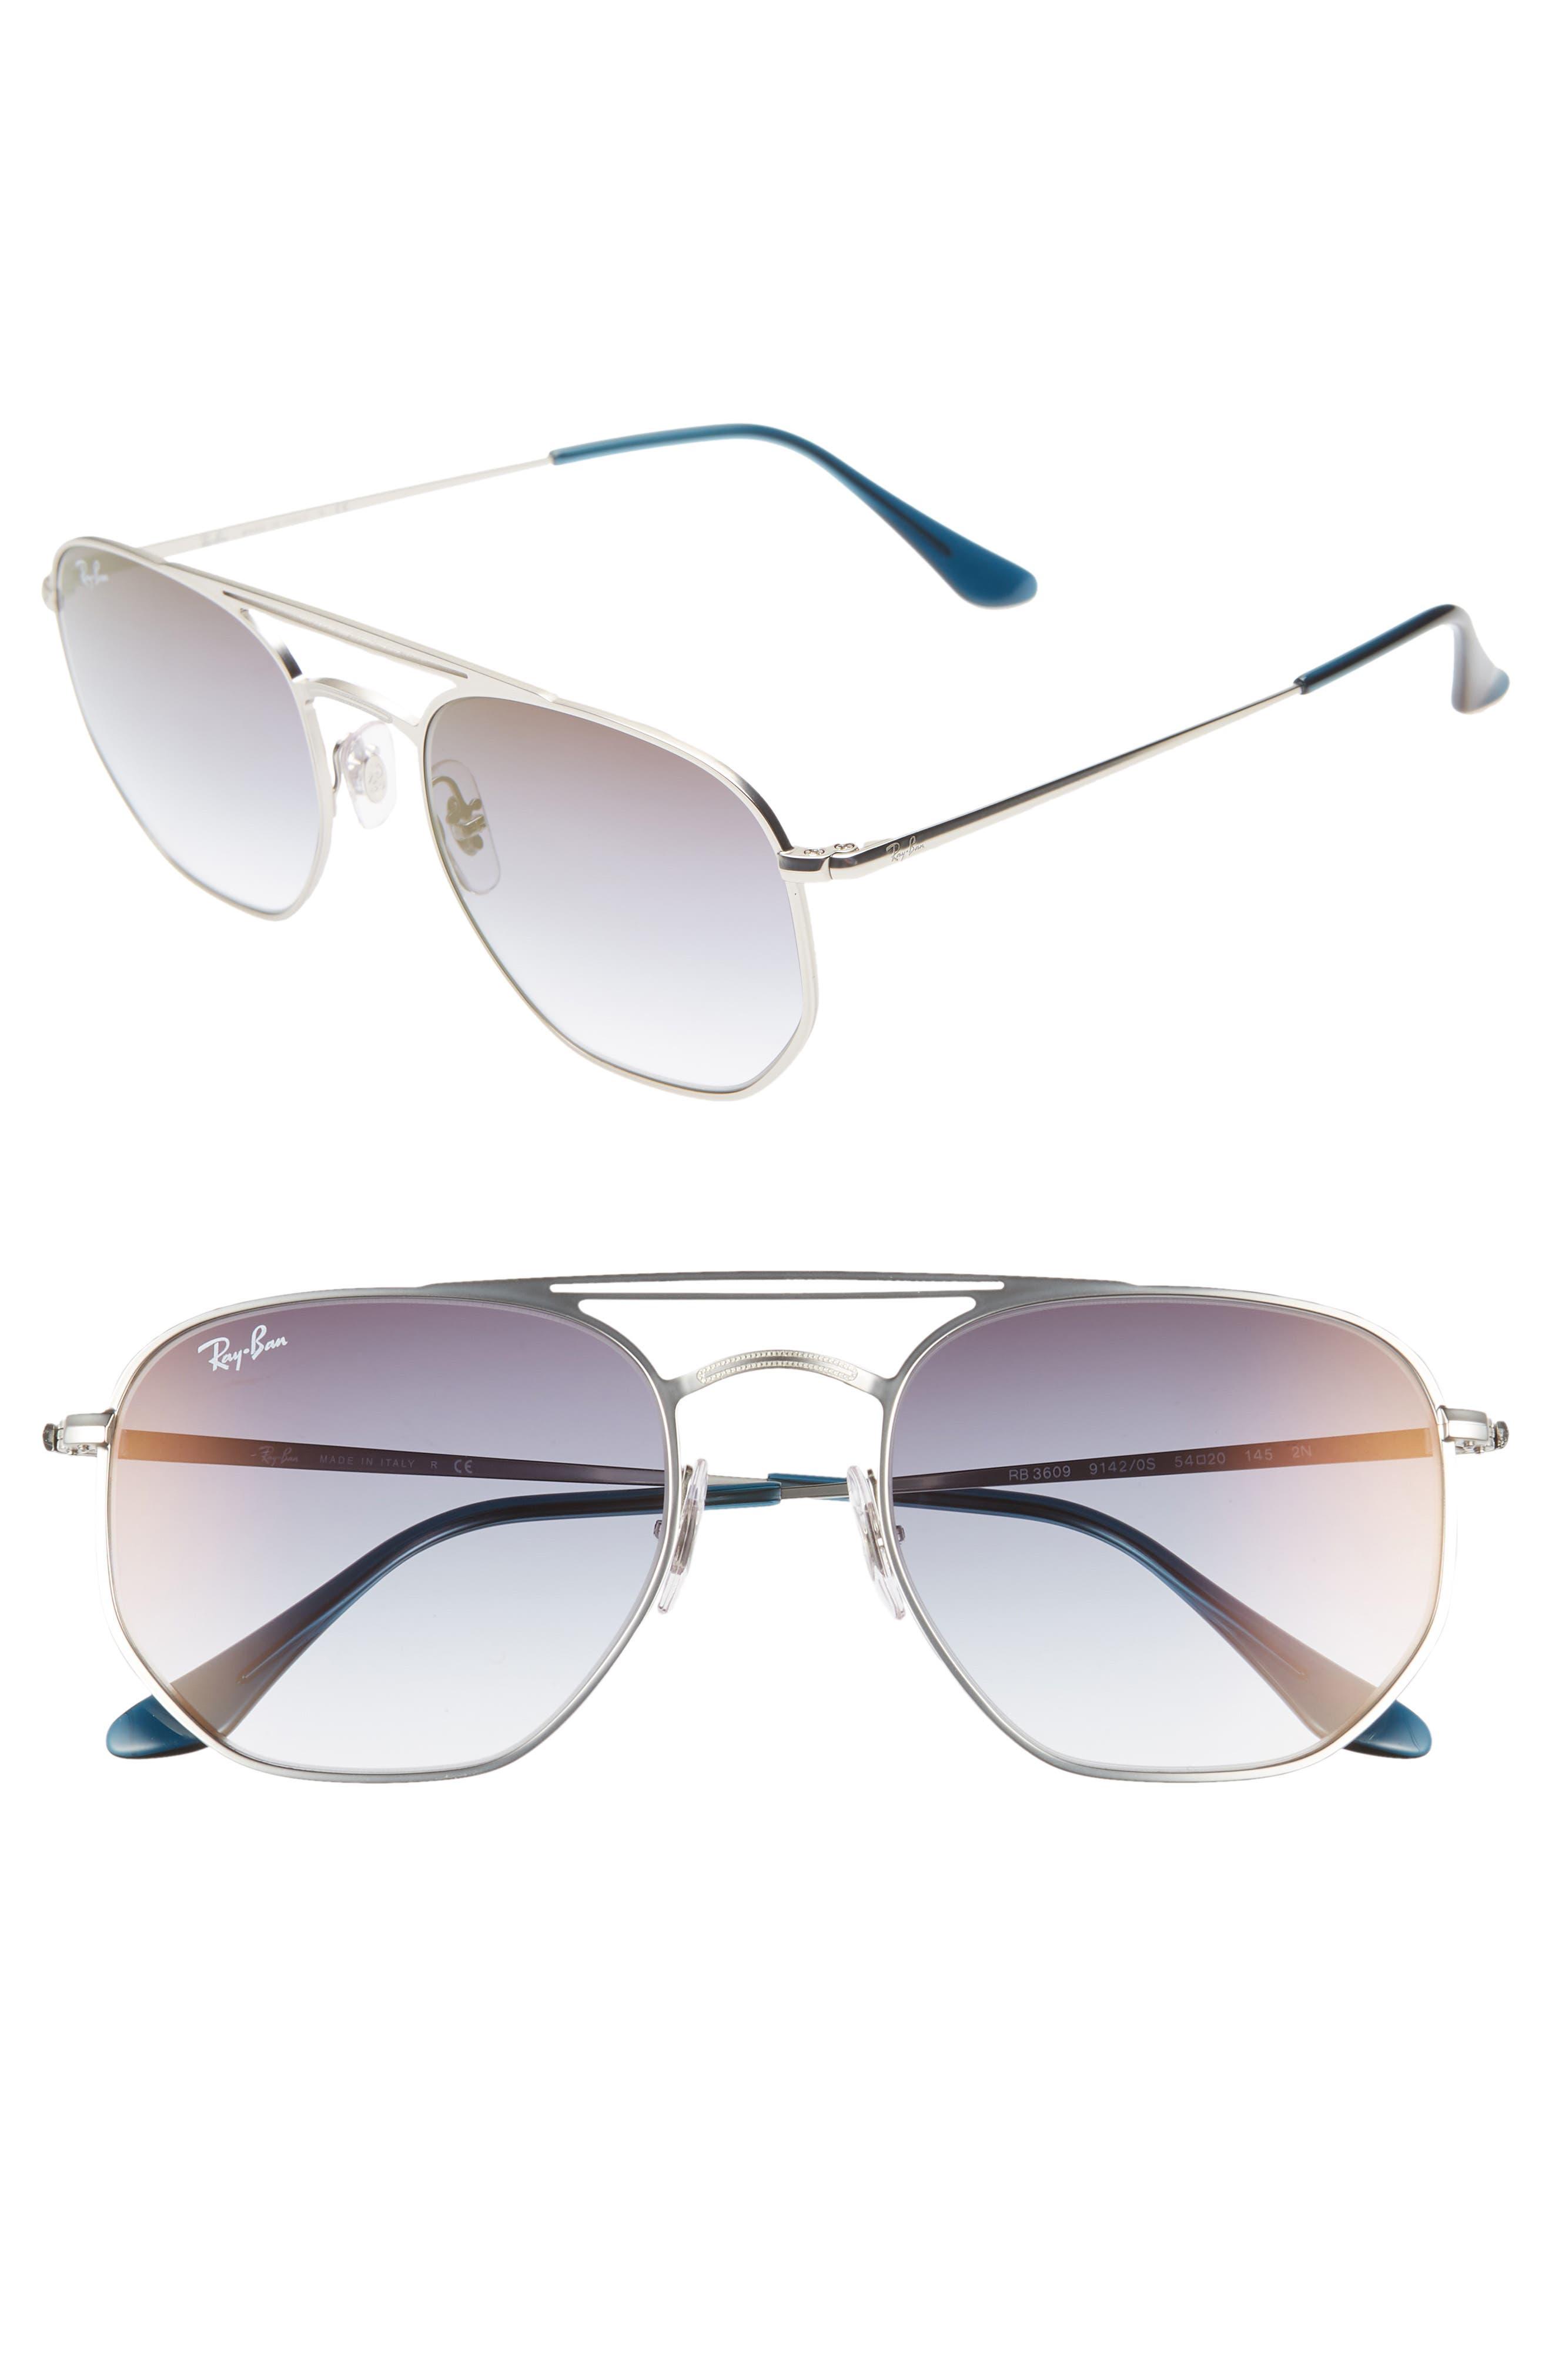 Ray-Ban Navigator 5m Double Bridge Sunglasses - Transparent Blue